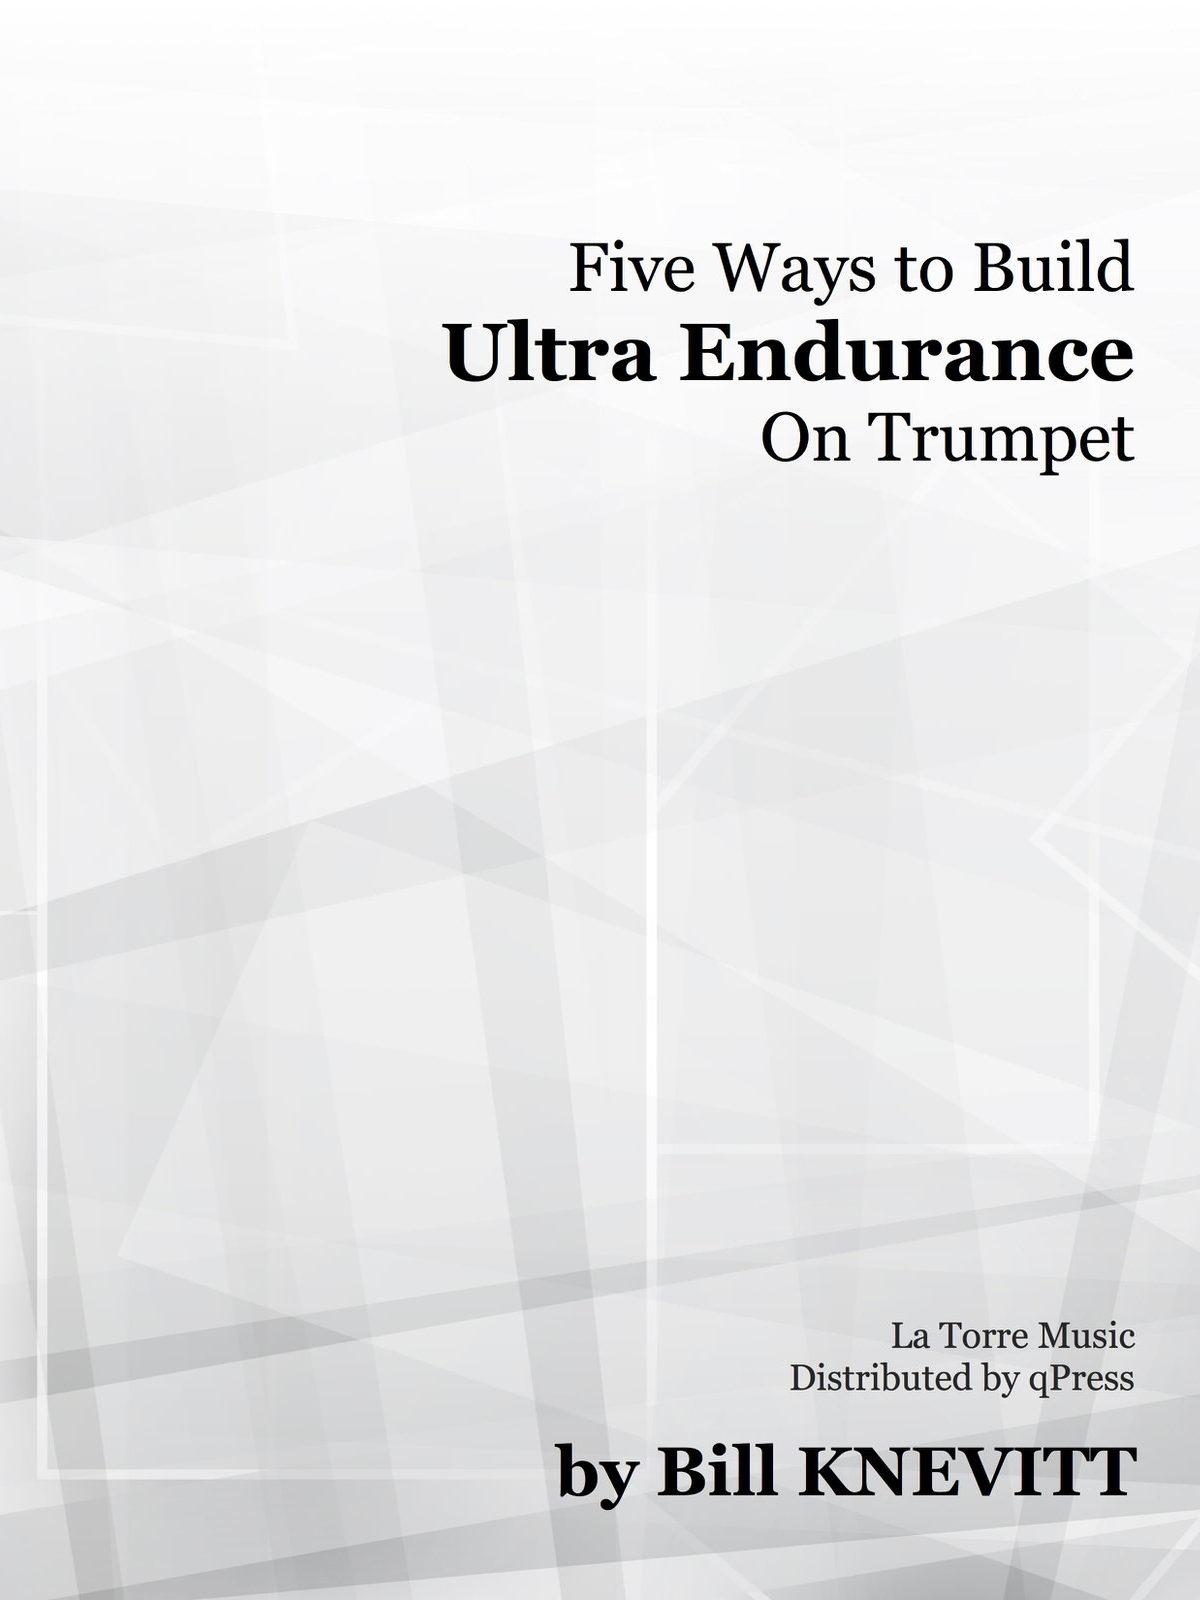 knevitt-five-ways-to-build-ultra-endurance-on-trumpet